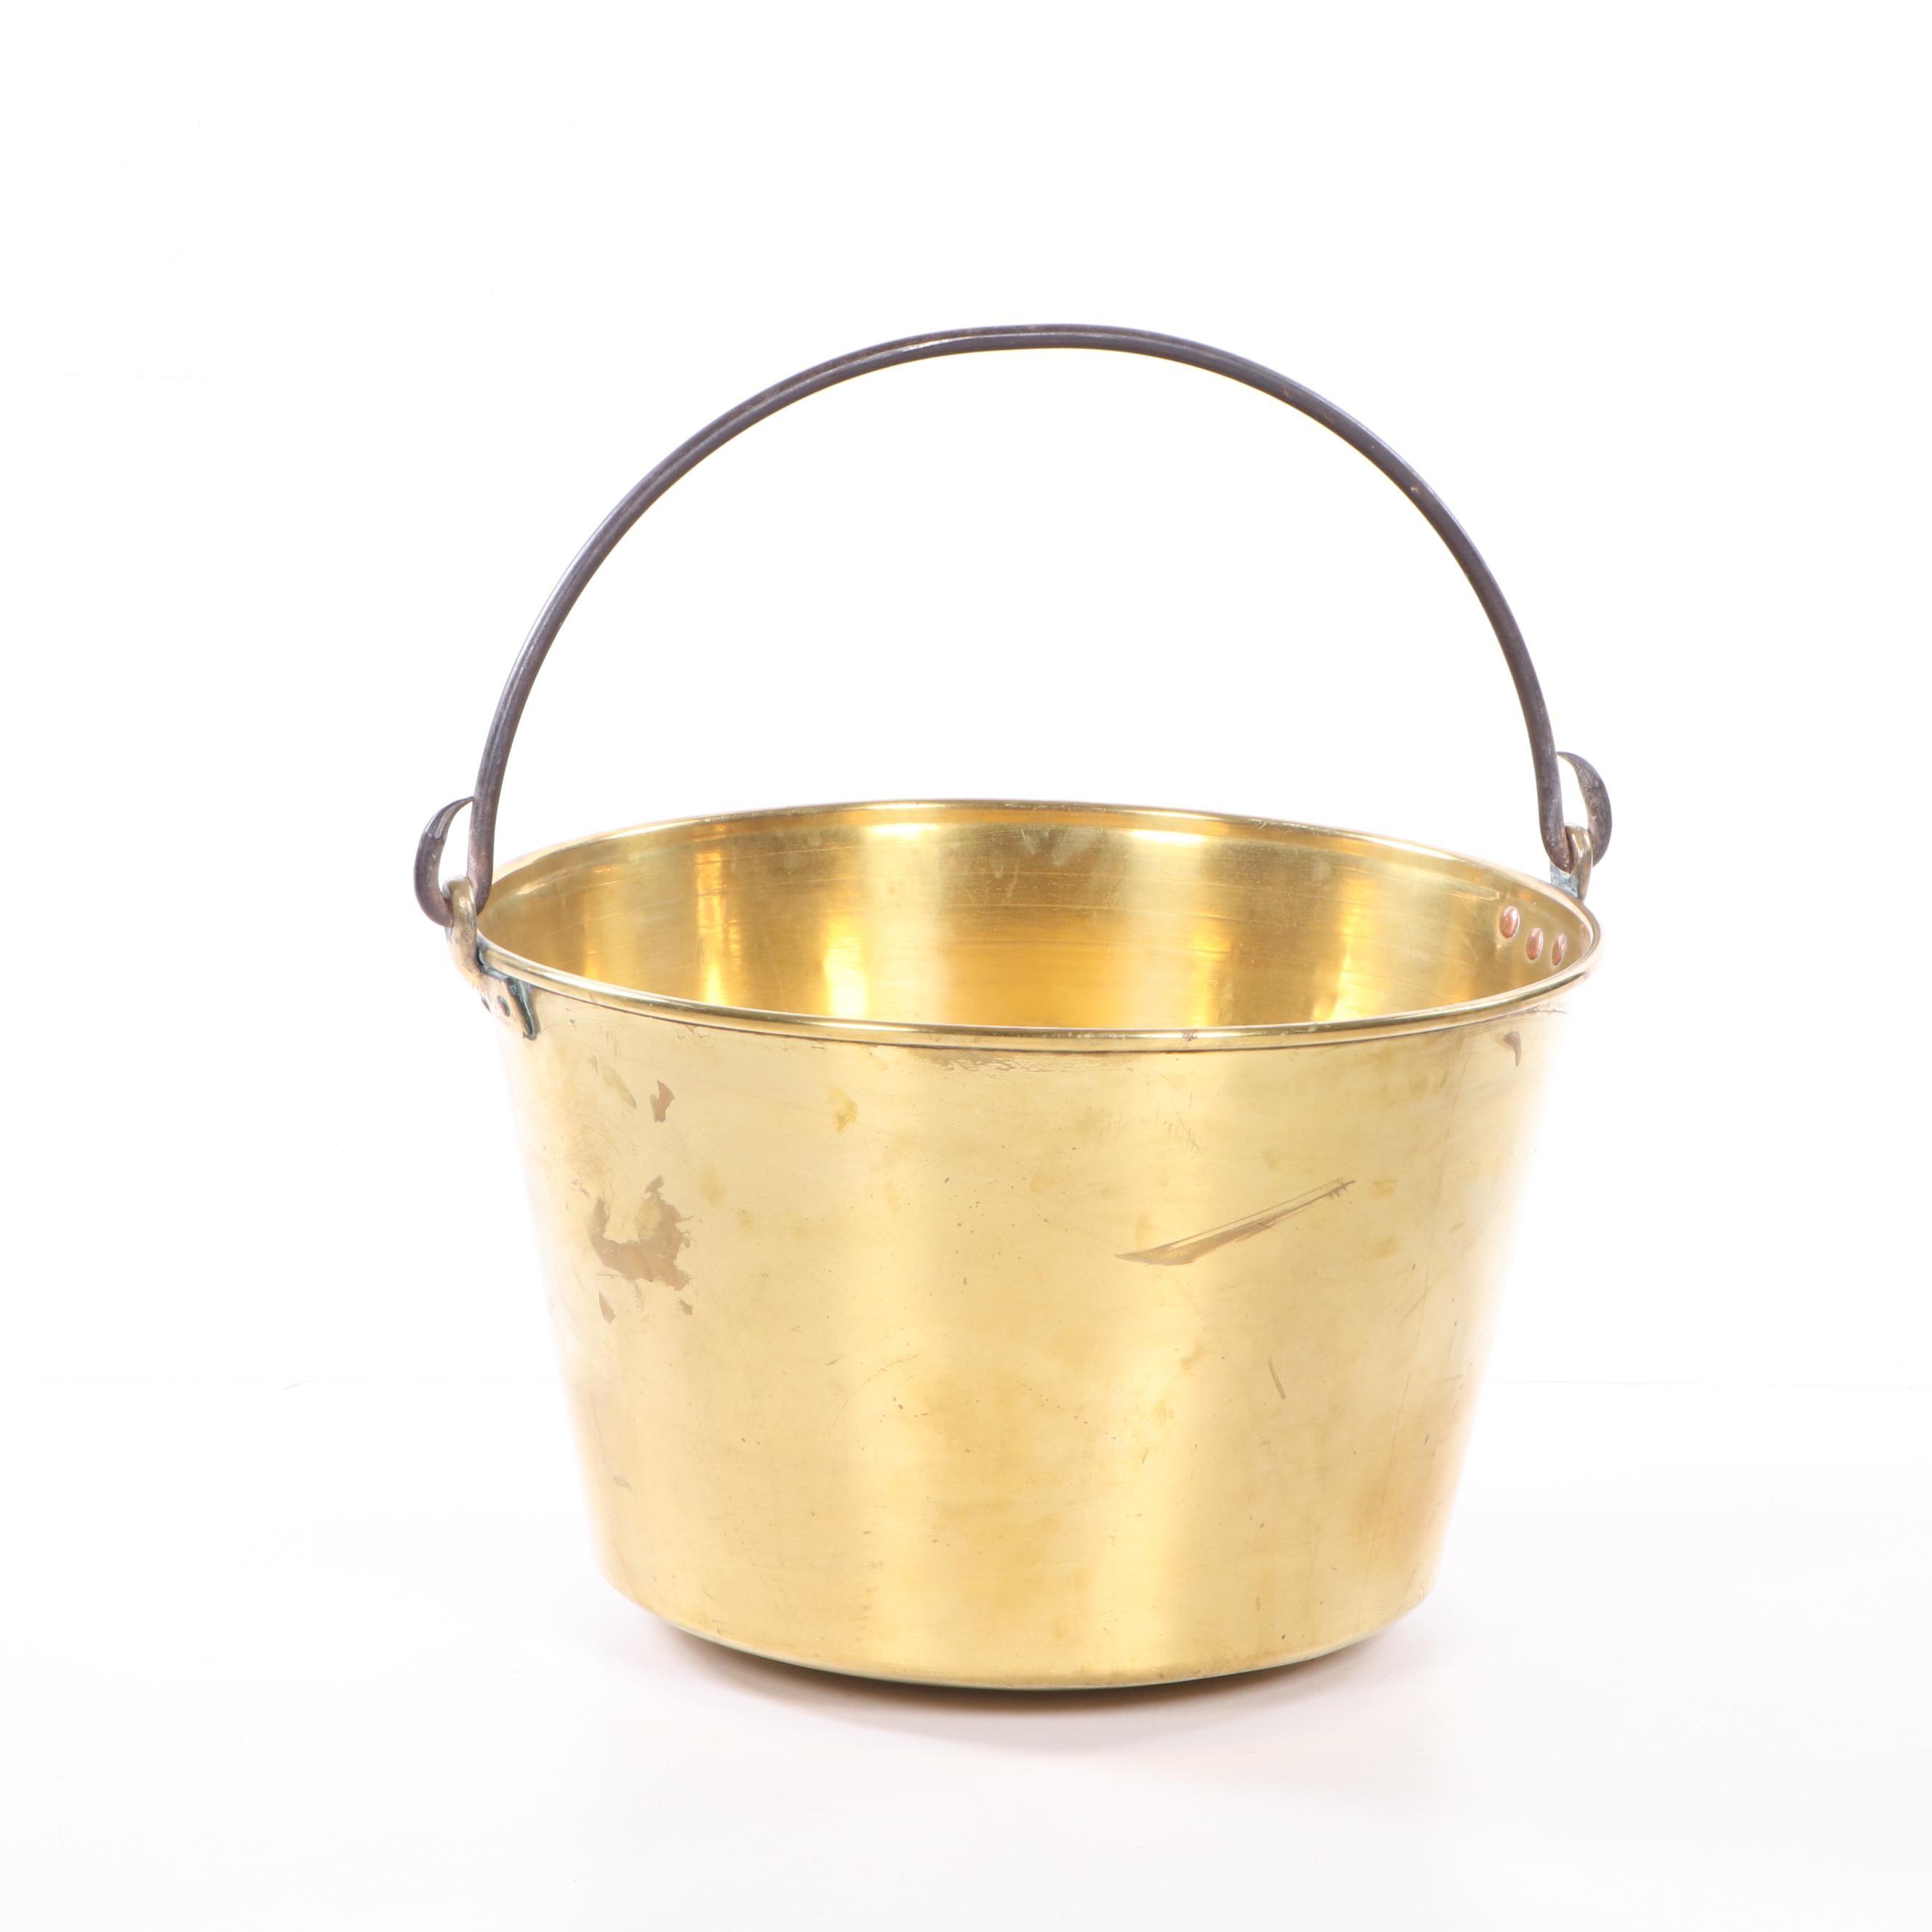 H.W. Hayden Brass Fireplace Bucket, Late 19th Century